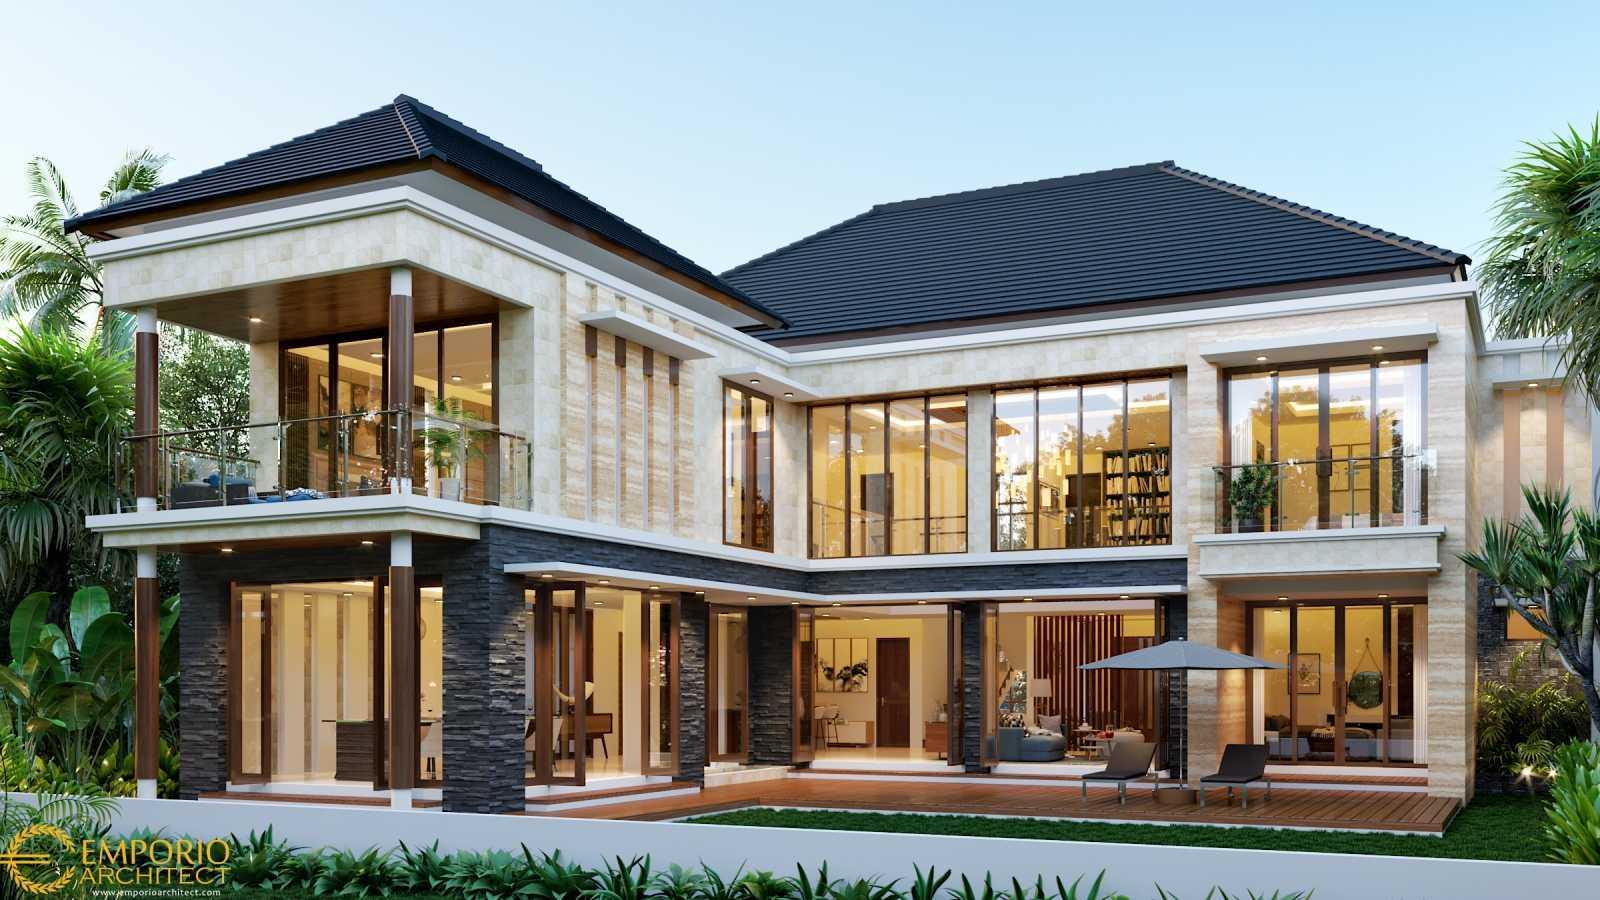 Emporio Architect Jasa Arsitek Sulawesi Desain Rumah Modern Tropis 541 @ Sulawesi Sulawesi, Indonesia Sulawesi, Indonesia Emporio-Architect-Jasa-Arsitek-Sulawesi-Desain-Rumah-Modern-Tropis-541-Sulawesi  81999